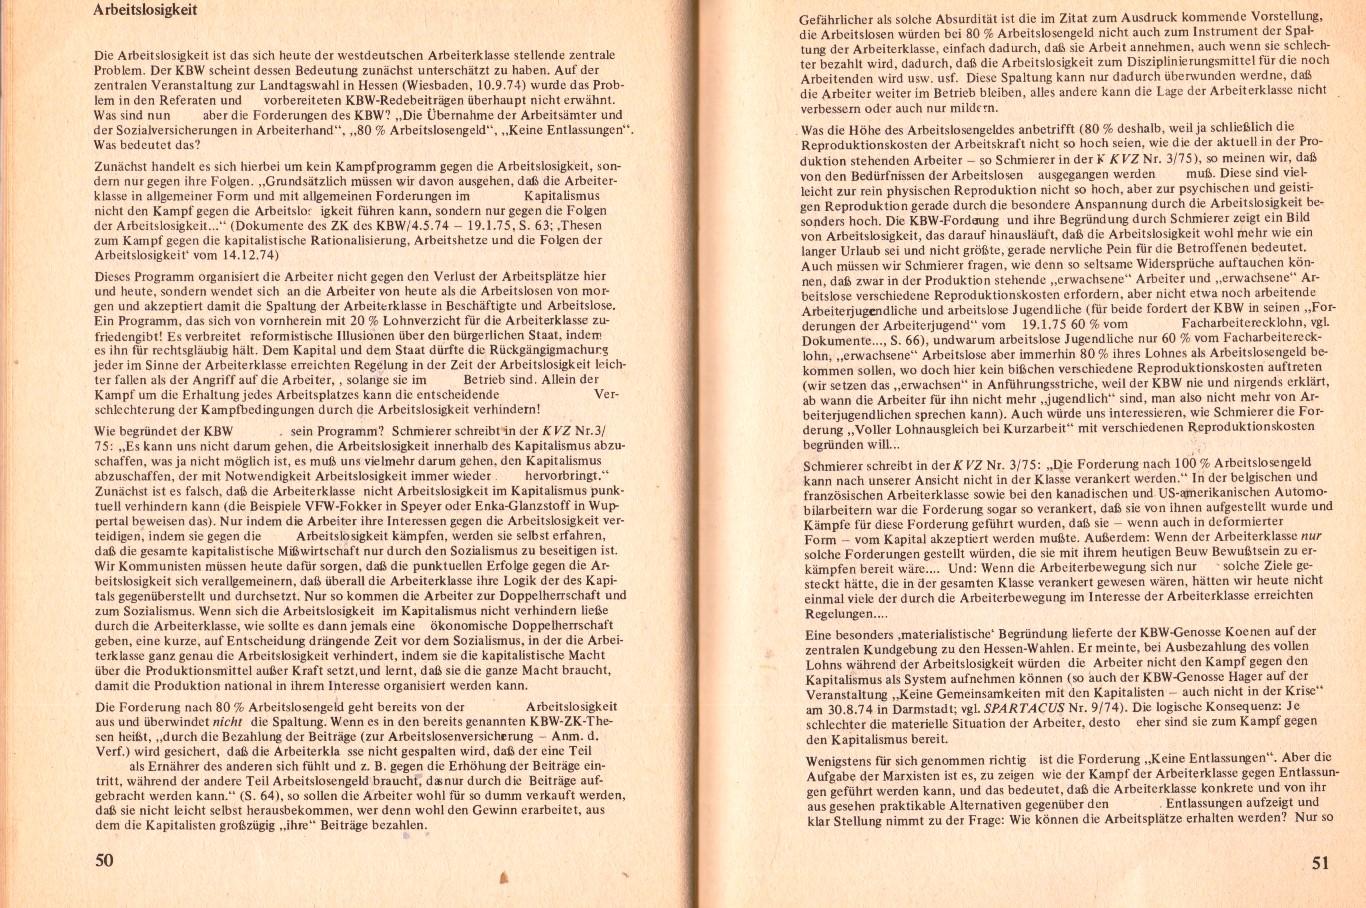 Spartacus_1975_Kritik_des_KBW_27